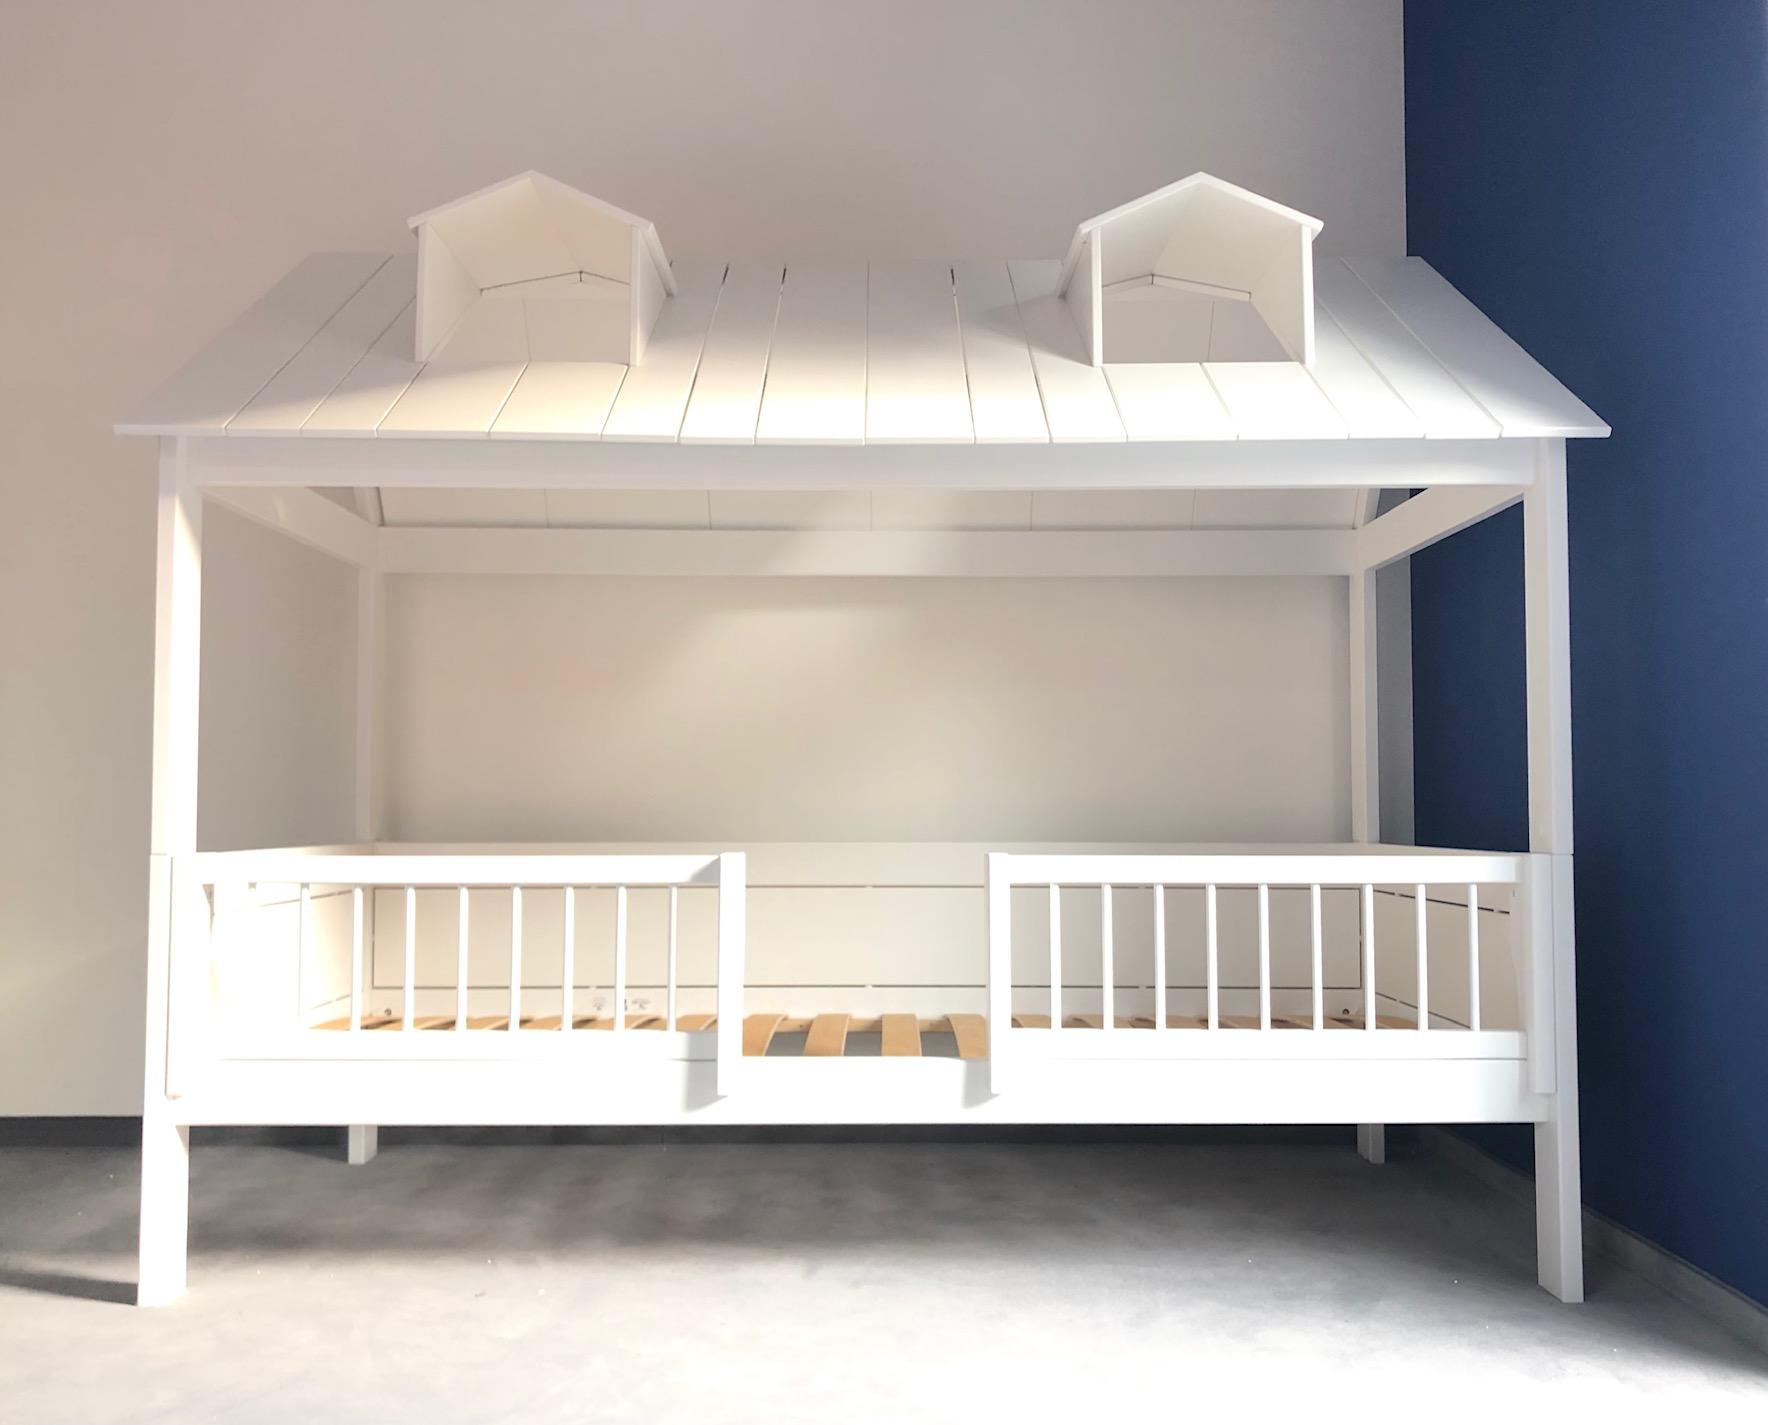 Full Size of Bett Mit Rückenlehne Amazon Betten 180x200 200x200 Komforthöhe 140x200 220 X 200 Holz Massivholz Bettkasten 1 40 Ausziehbar Ohne Kopfteil 90x200 Lattenrost Bett Lifetime Bett